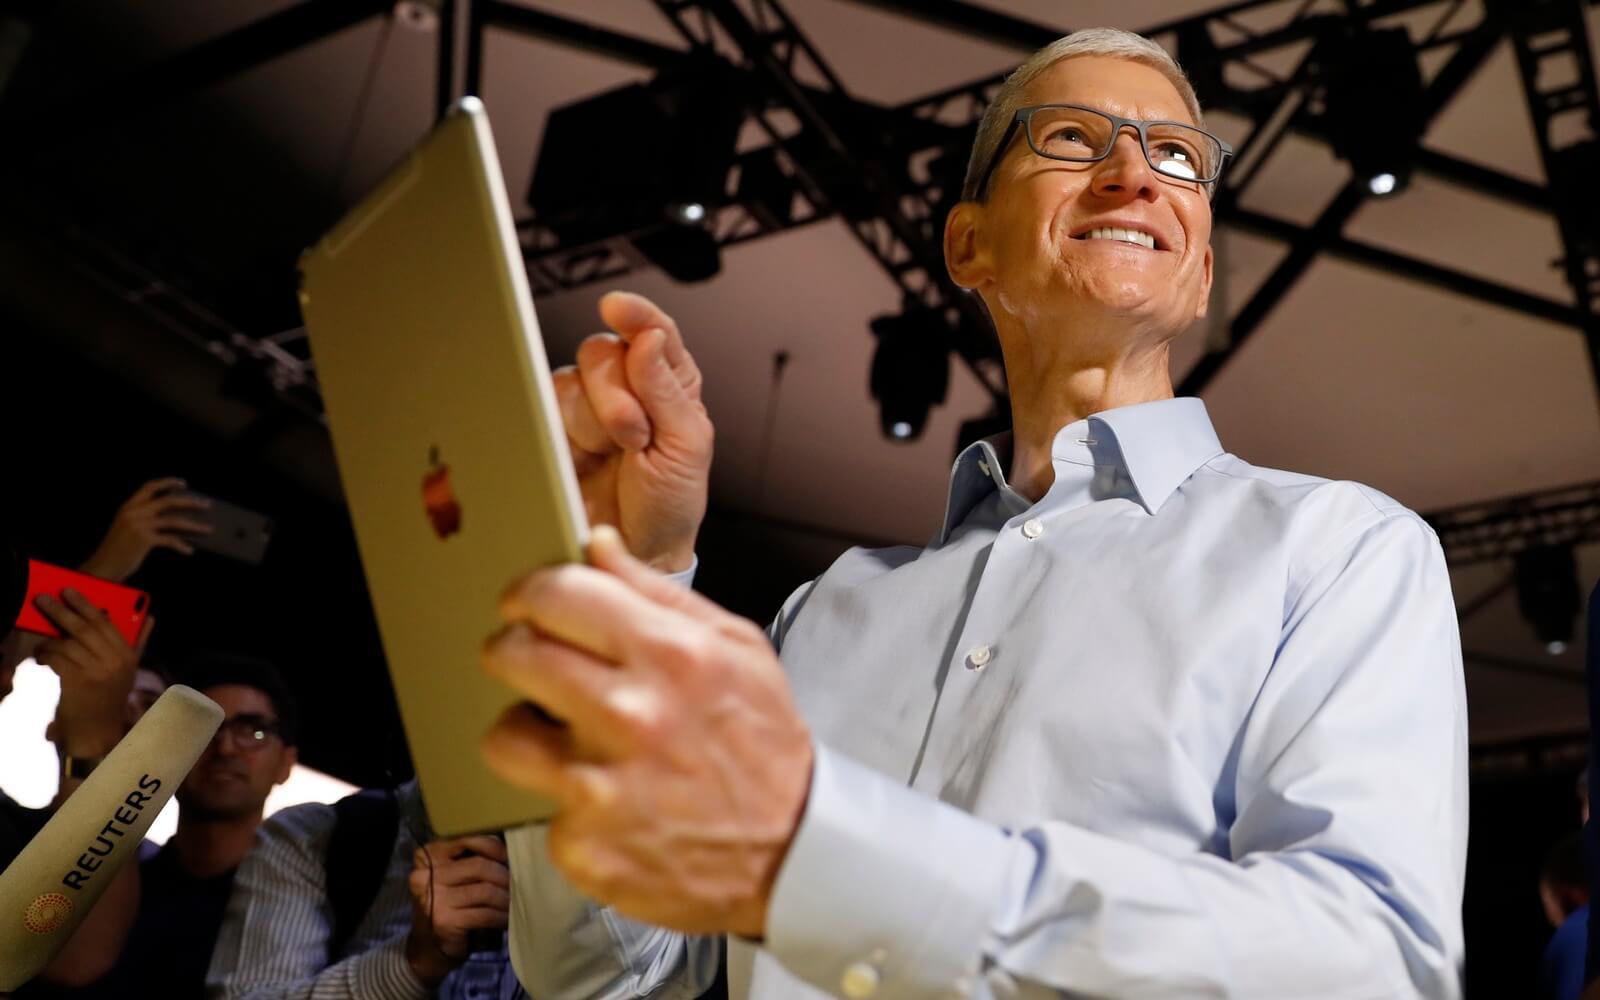 Какие новинки Apple представит на конференции WWDC 2018?